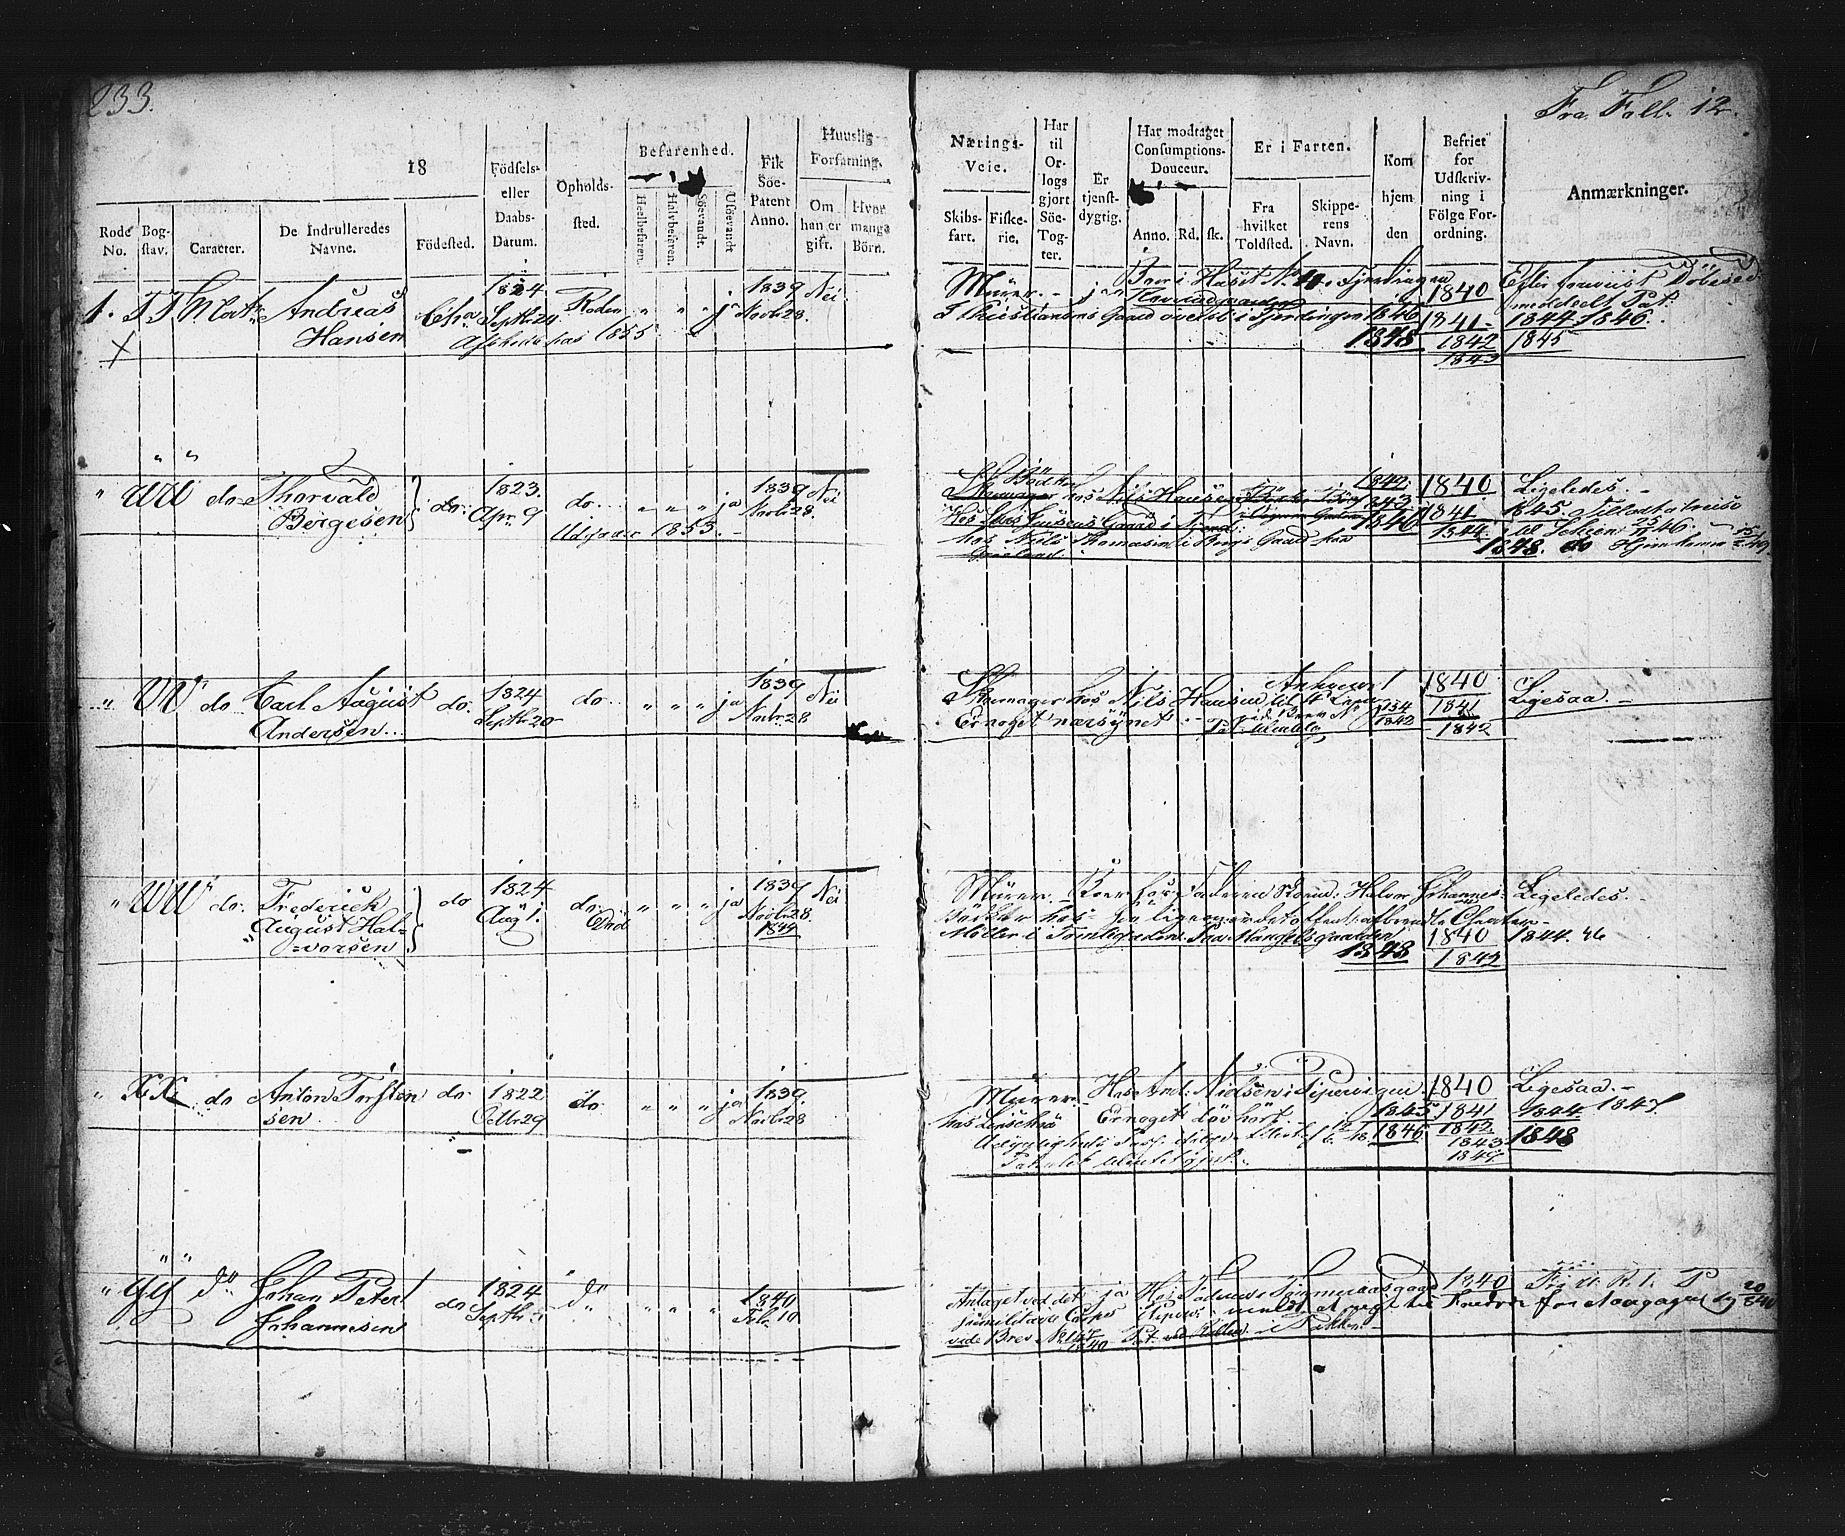 SAO, Oslo mønstringskontor, F/Fc/Fcb/L0001: Hovedrulle, 1819, s. 233